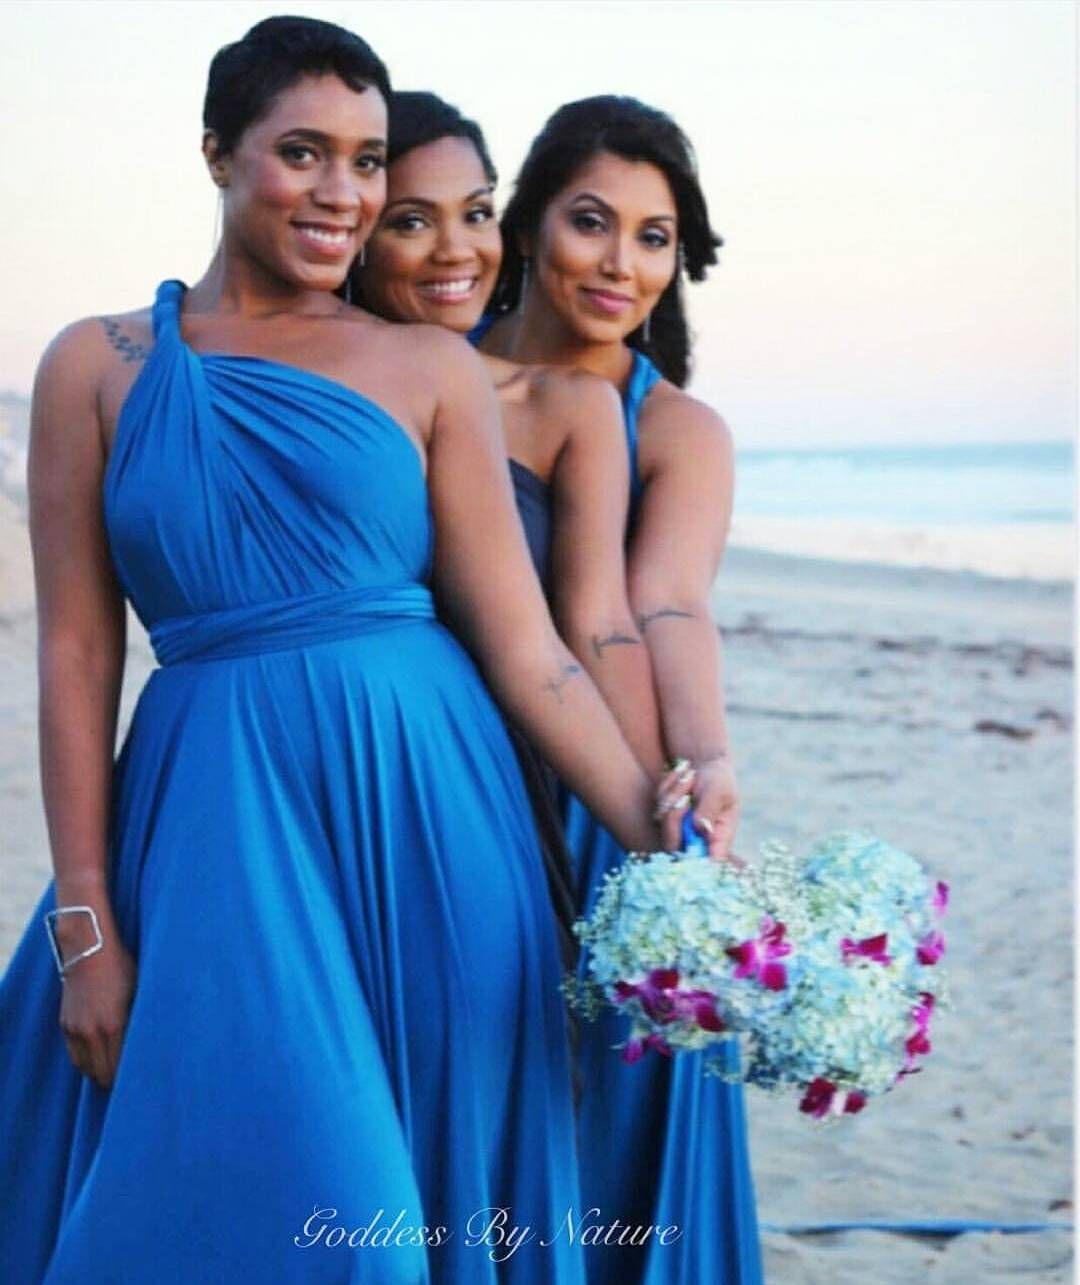 Our gorgeous customers in Malibu wearing the Goddess By Nature Multiway Dress in Island Paradise #whiterunway #wedding #malibuweddings #goddessbynature